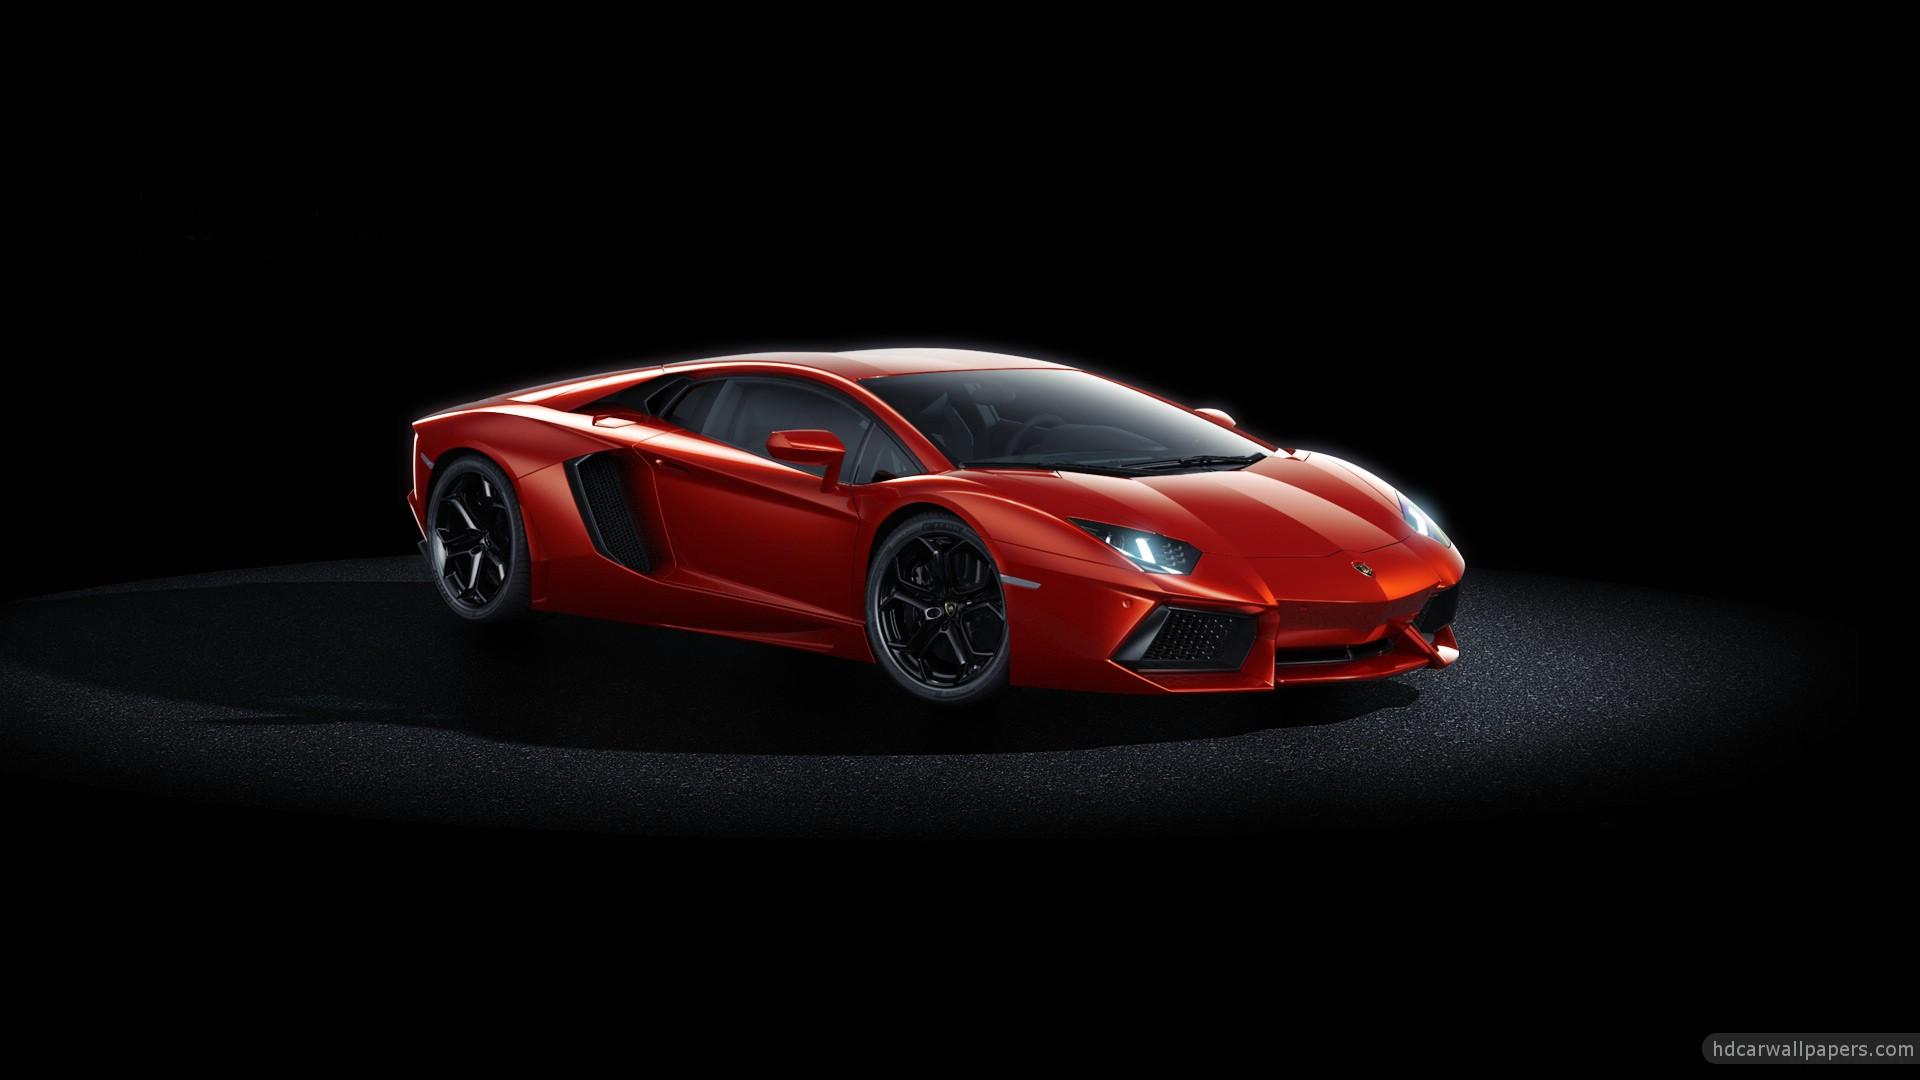 Lamborghini Aventador Lp700 4 Wallpaper 555415